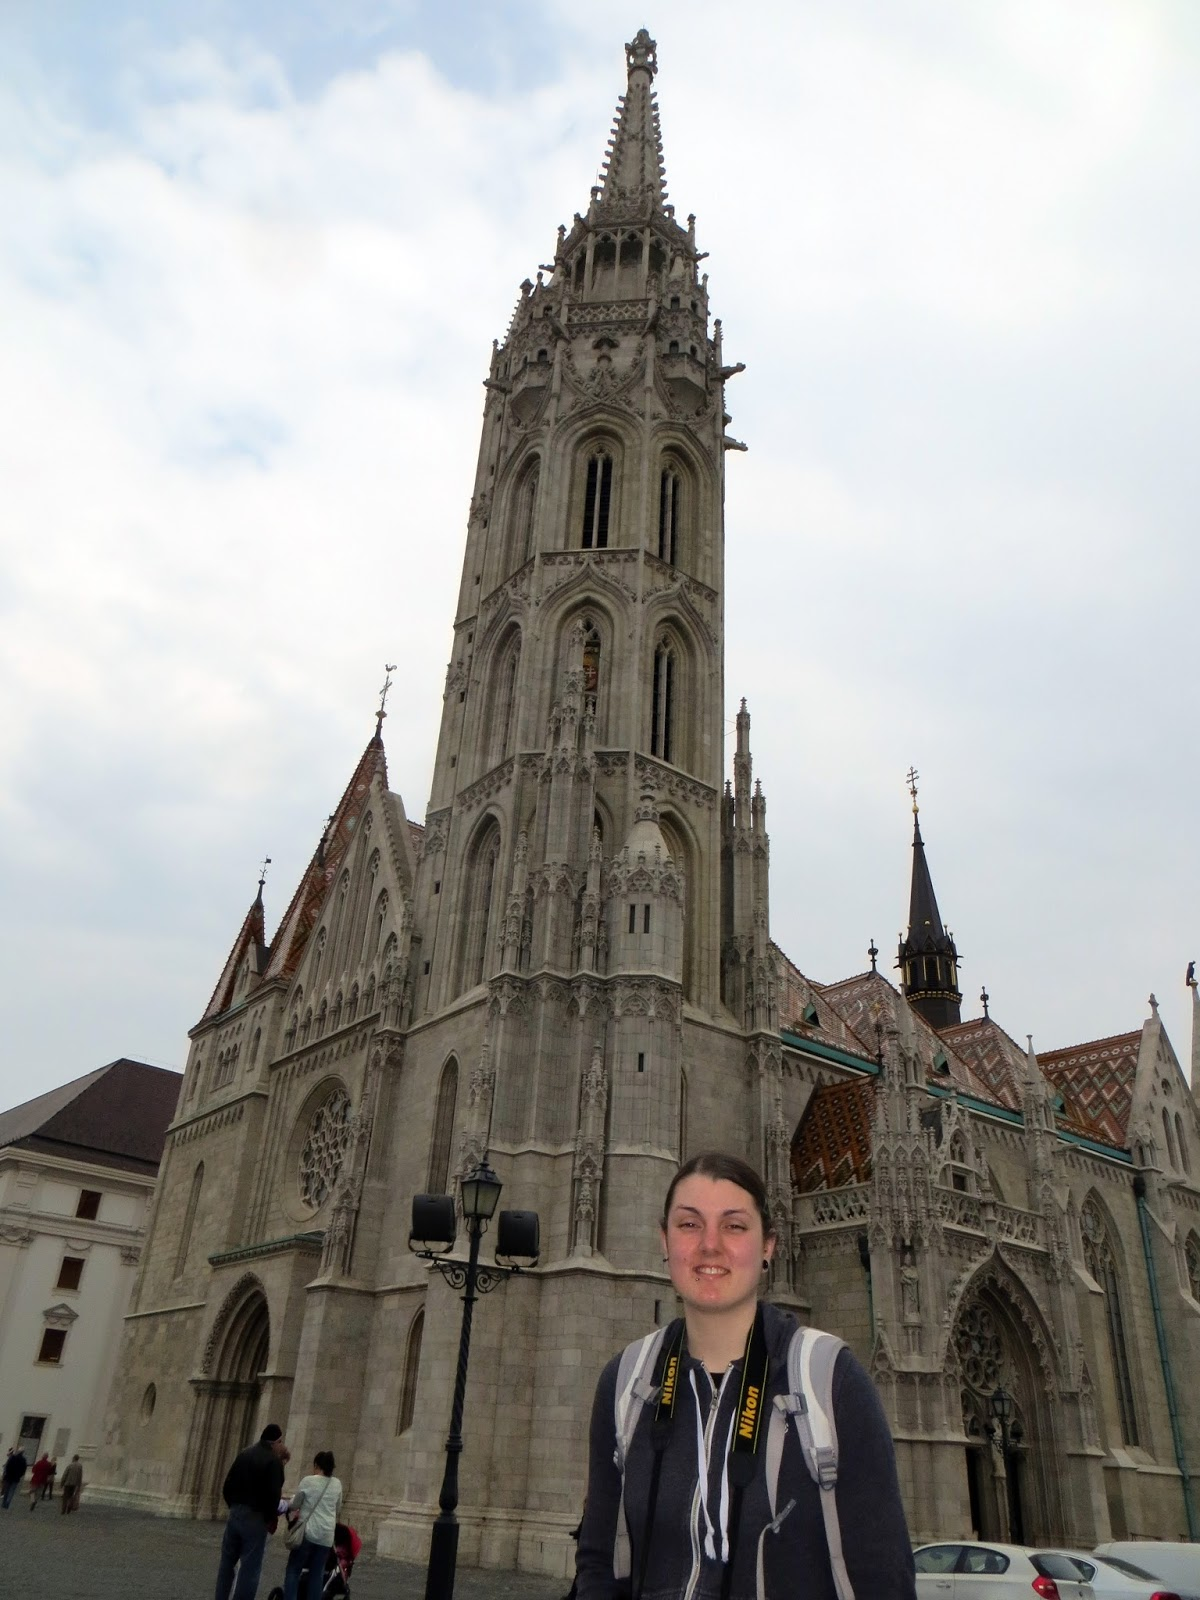 Budapest, photography, night time, architecture, travel, blog, adventure, exploration, chain bridge, Danube, funicular, buda castle, buda hill, old, traditional, Matthias church